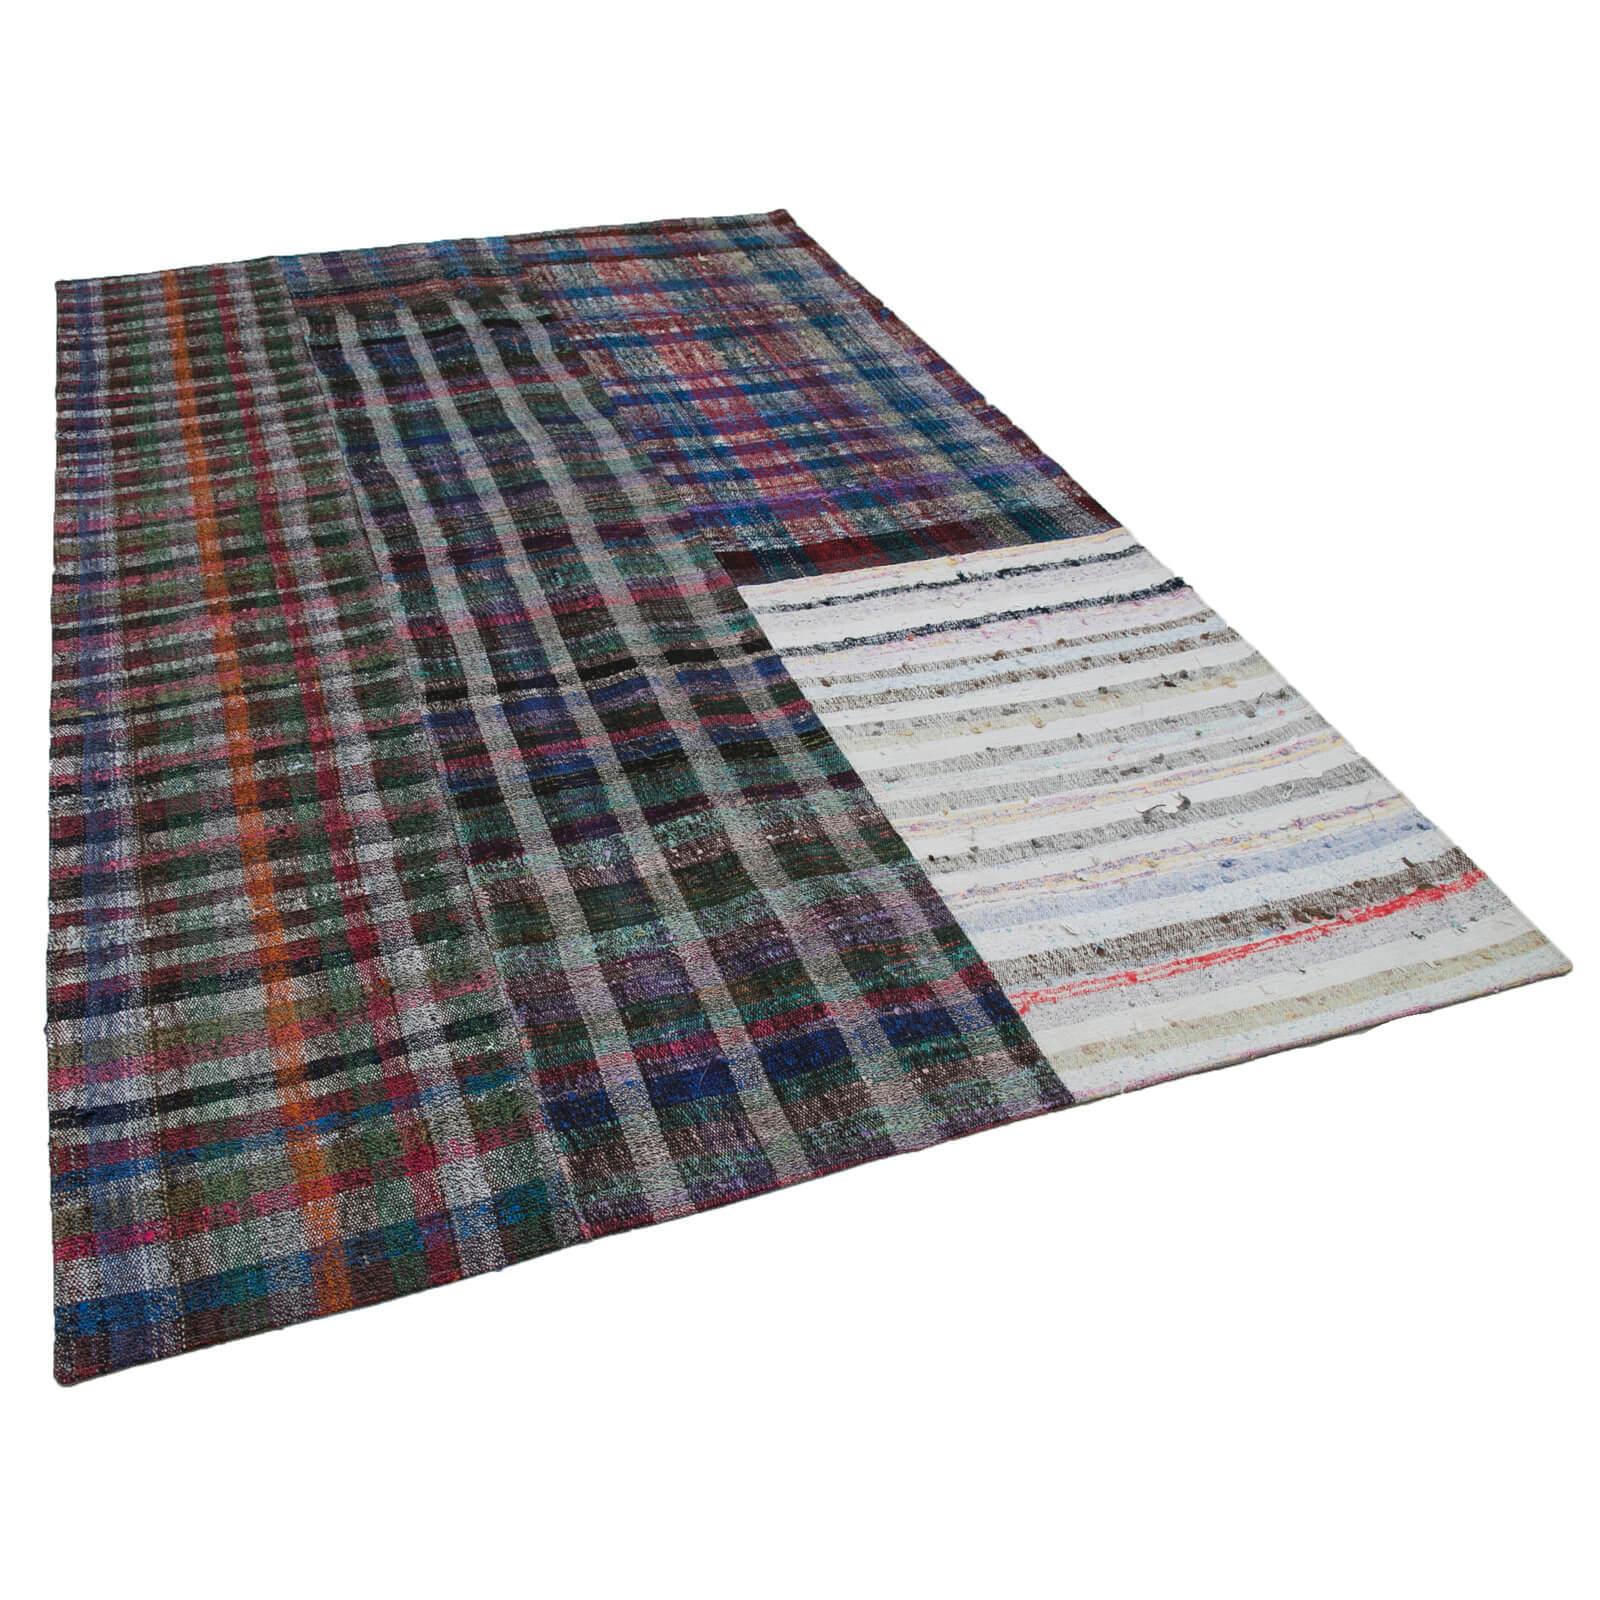 300x200 cm multicolorido tapetes artesanais retalhos Rug-7x10 pés